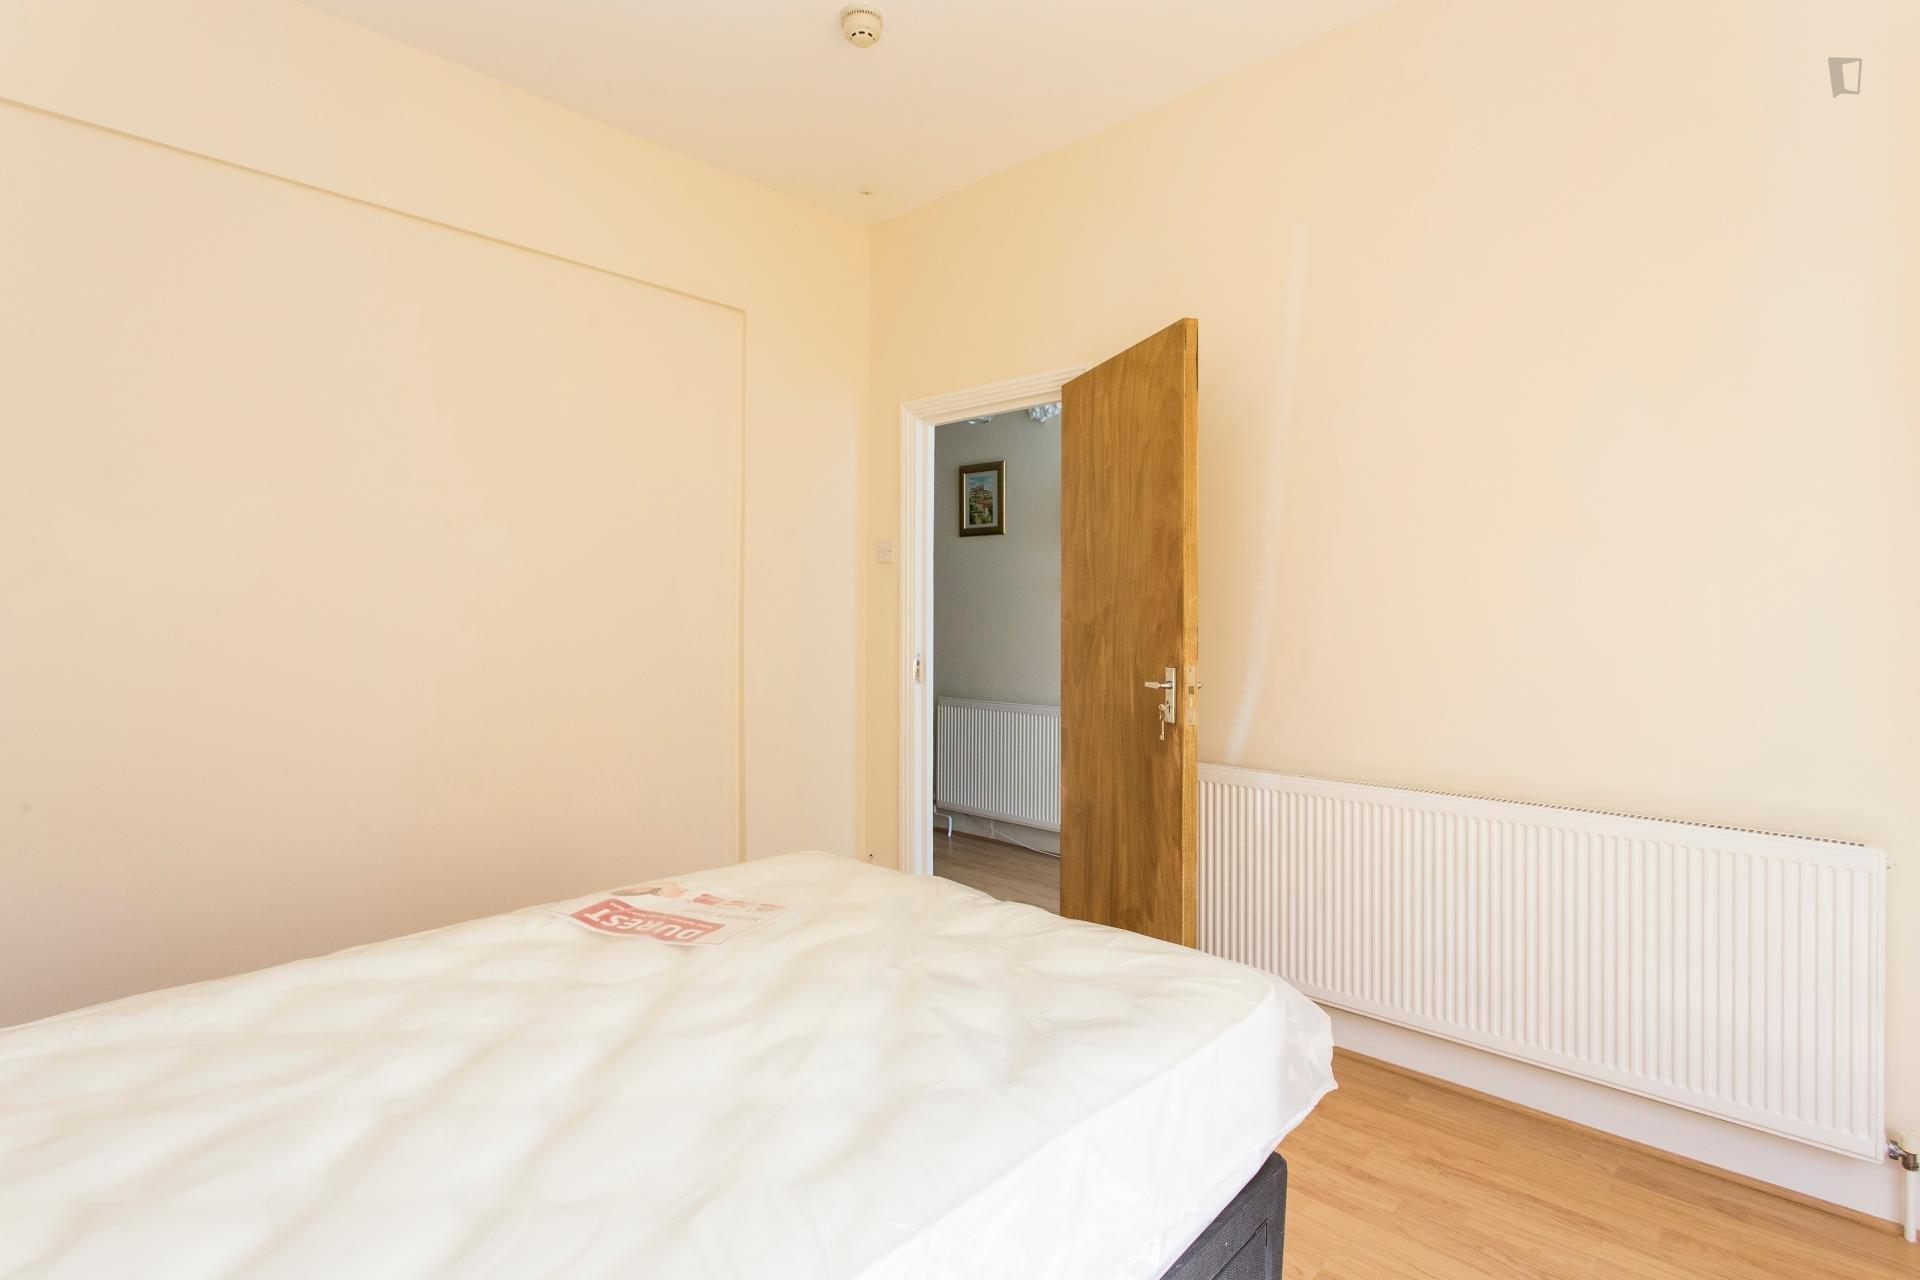 Reve Road - Entry ready bedroom in London